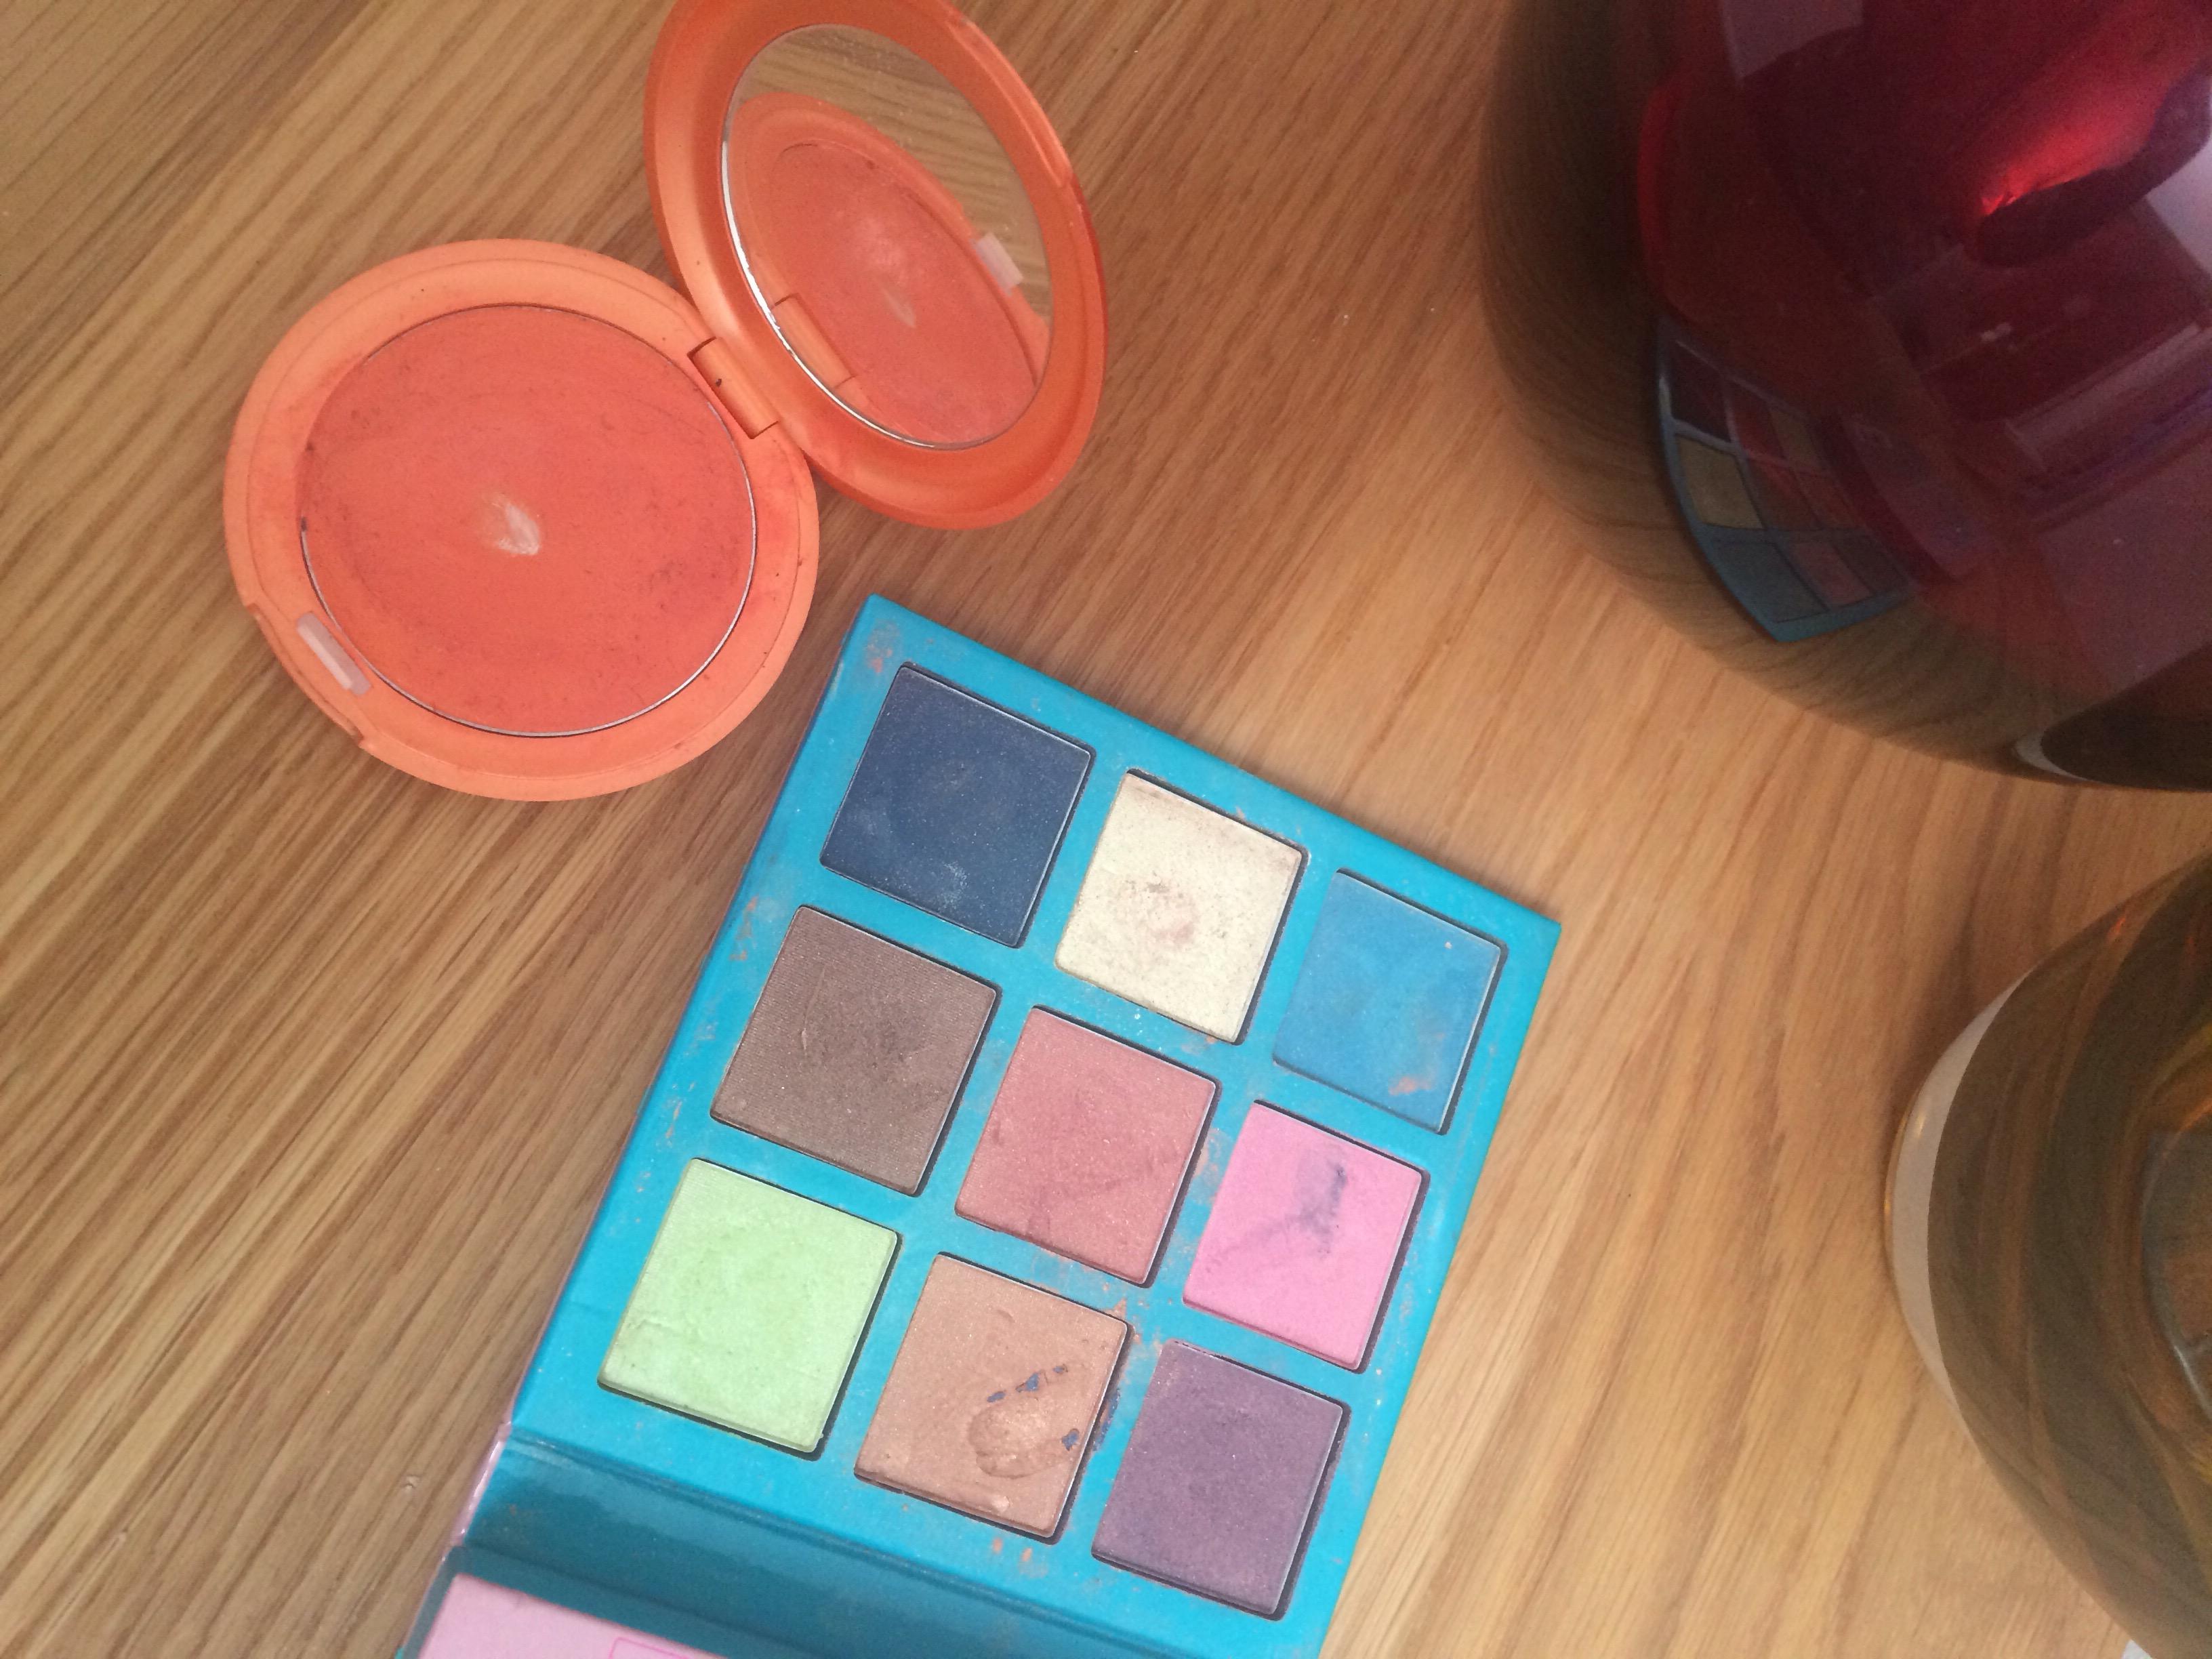 colour-correction-corrector-hack-trick-blusher-lipstick-eyeshadow